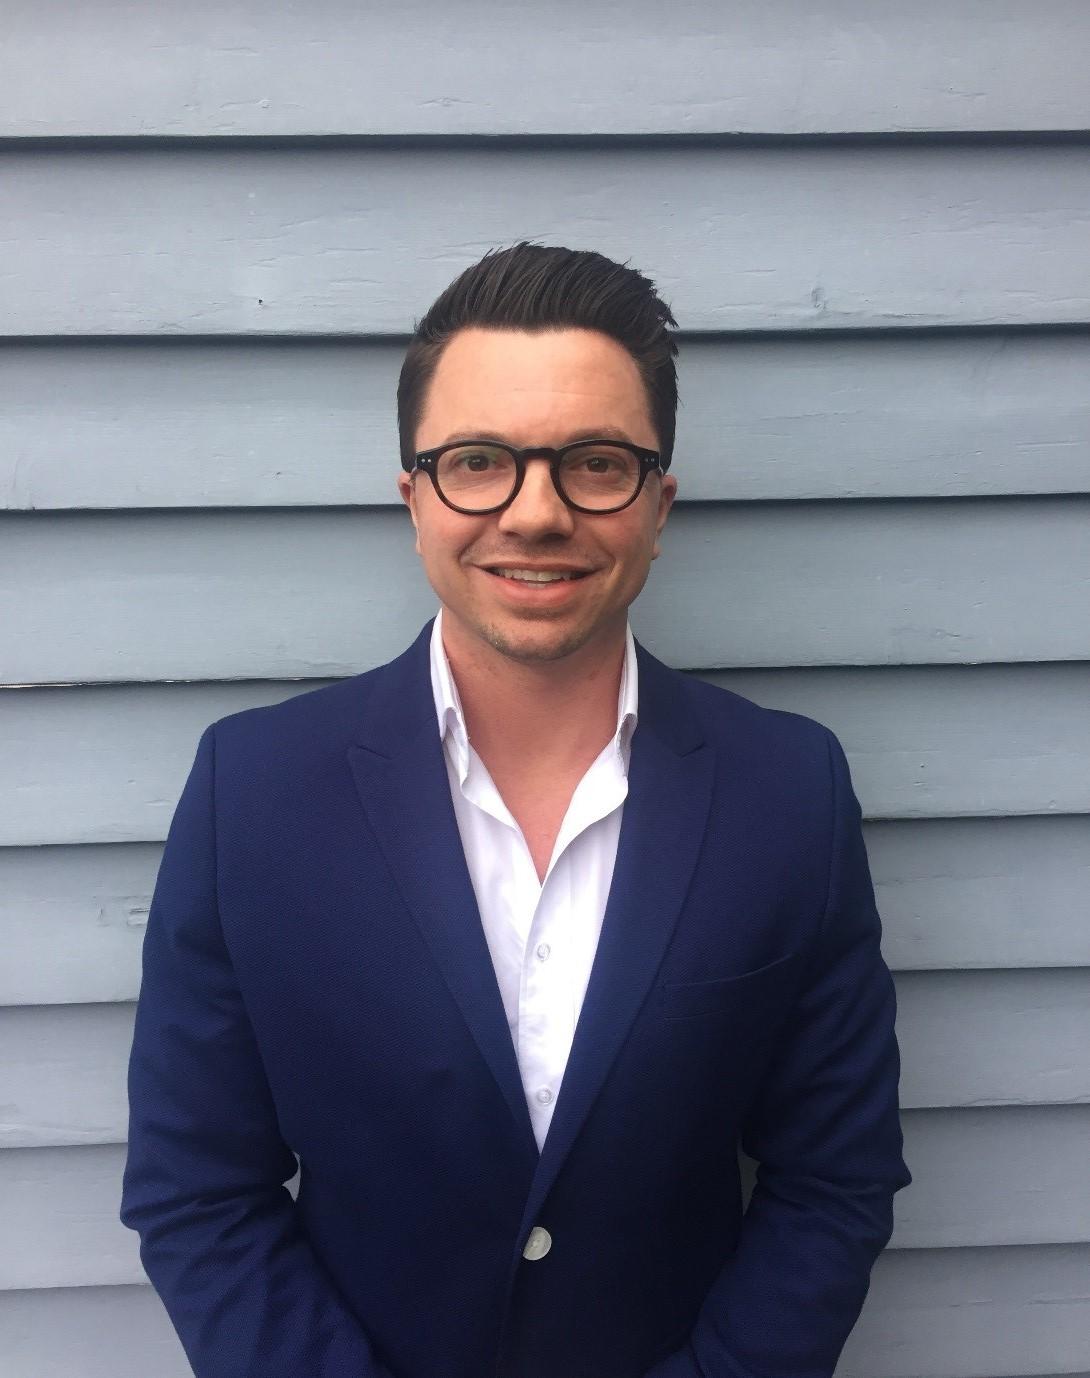 Sam Harris Client Service Directo Starcom Melbourne